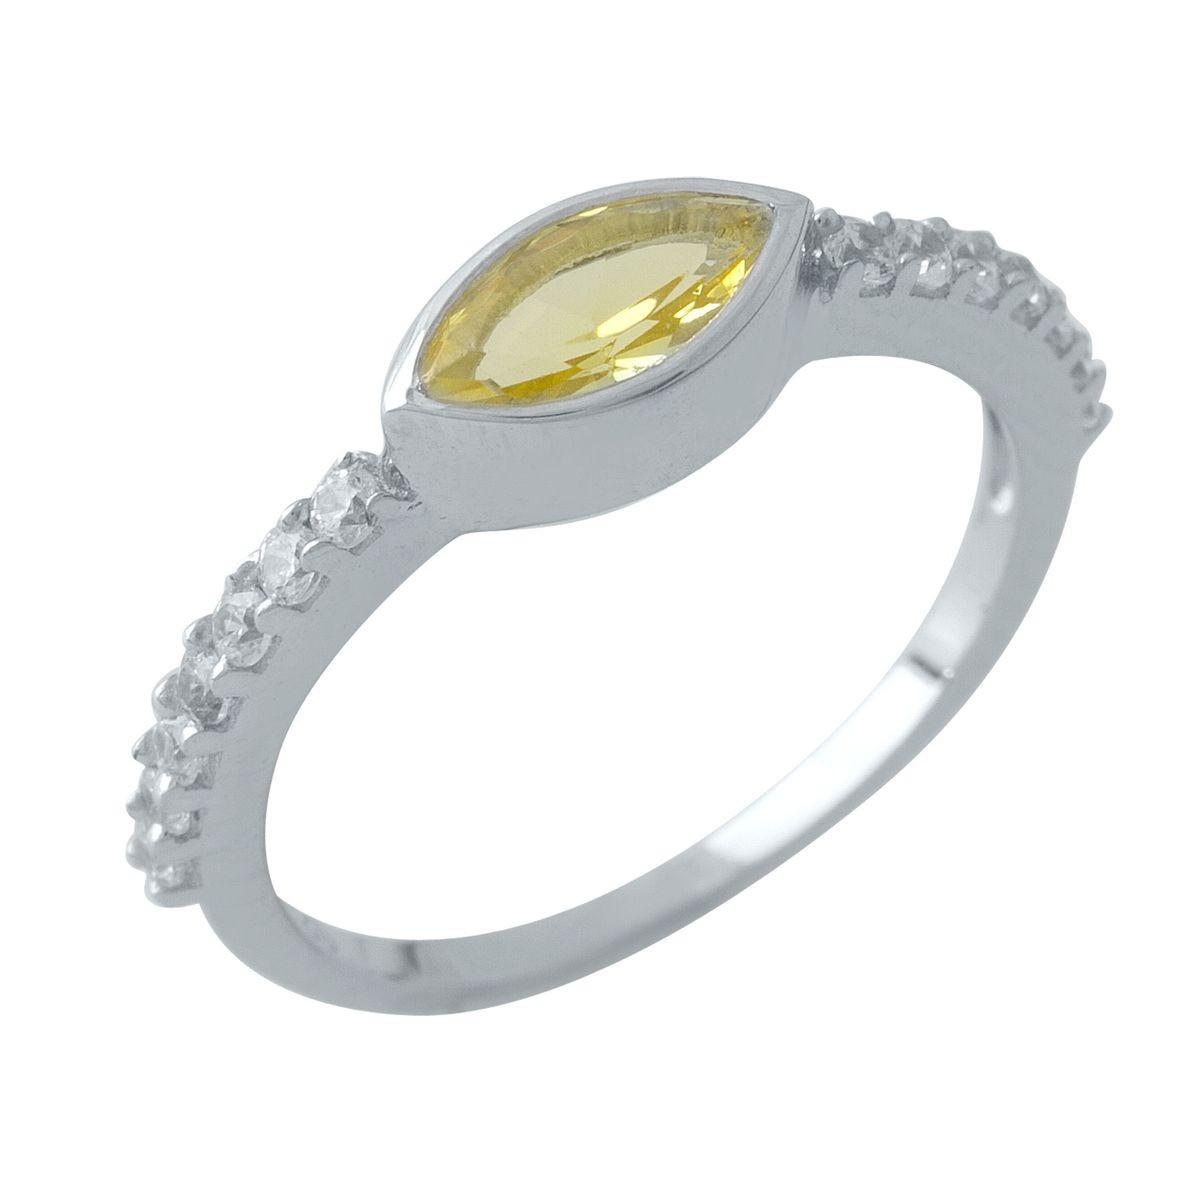 Серебряное кольцо pSilverAlex с цитрином nano (1970805) 18.5 размер